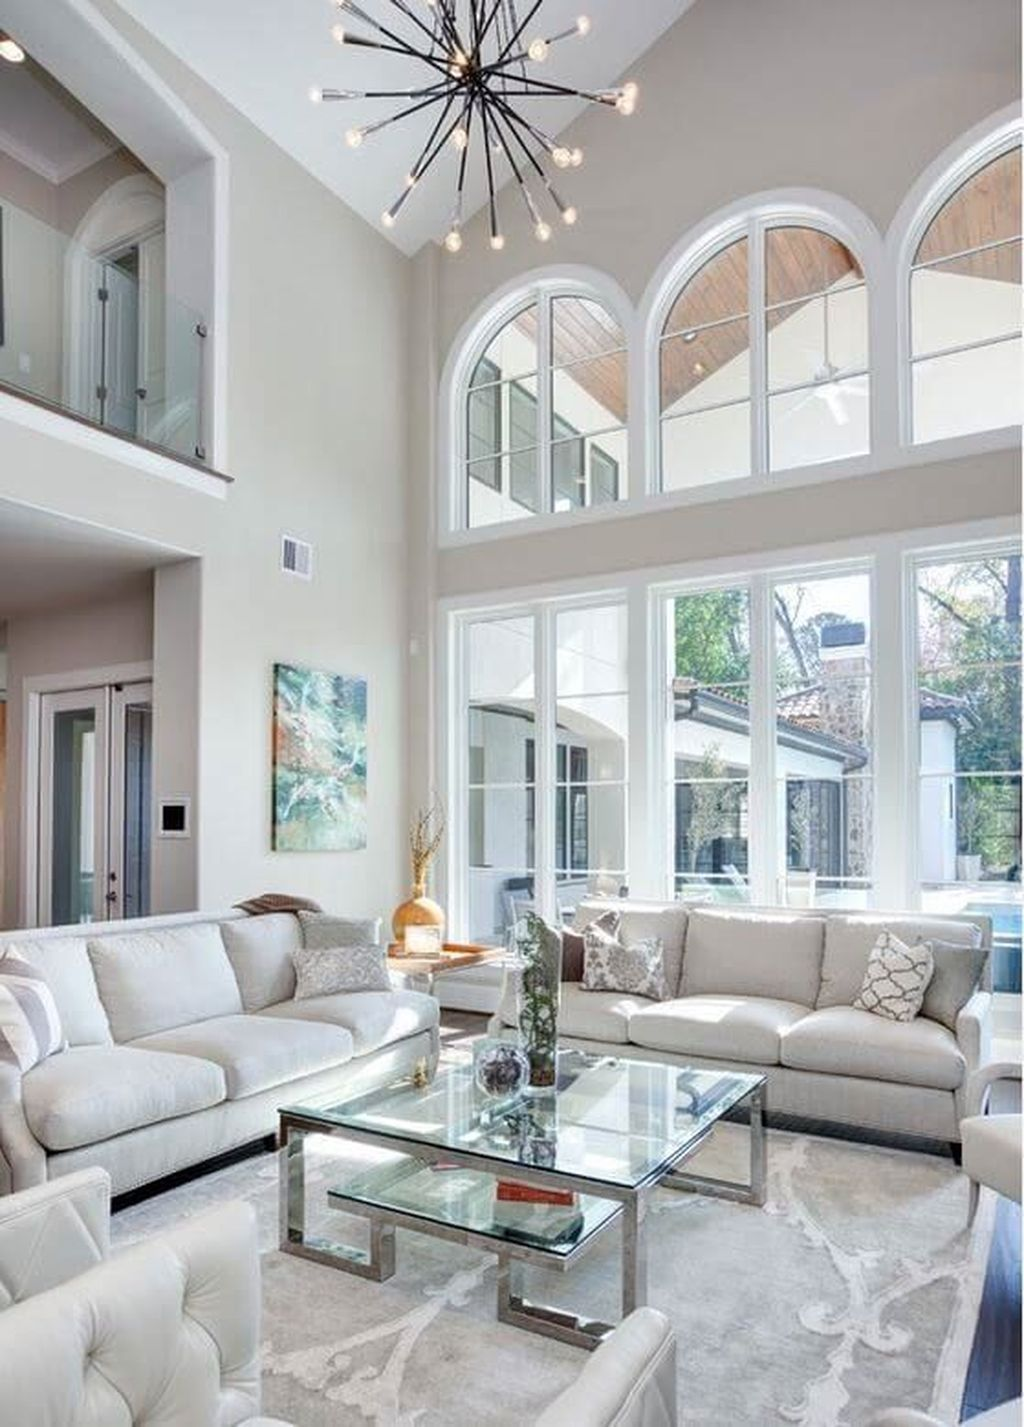 30+ Creative Formal Living Room Decor Ideas | Formal ...